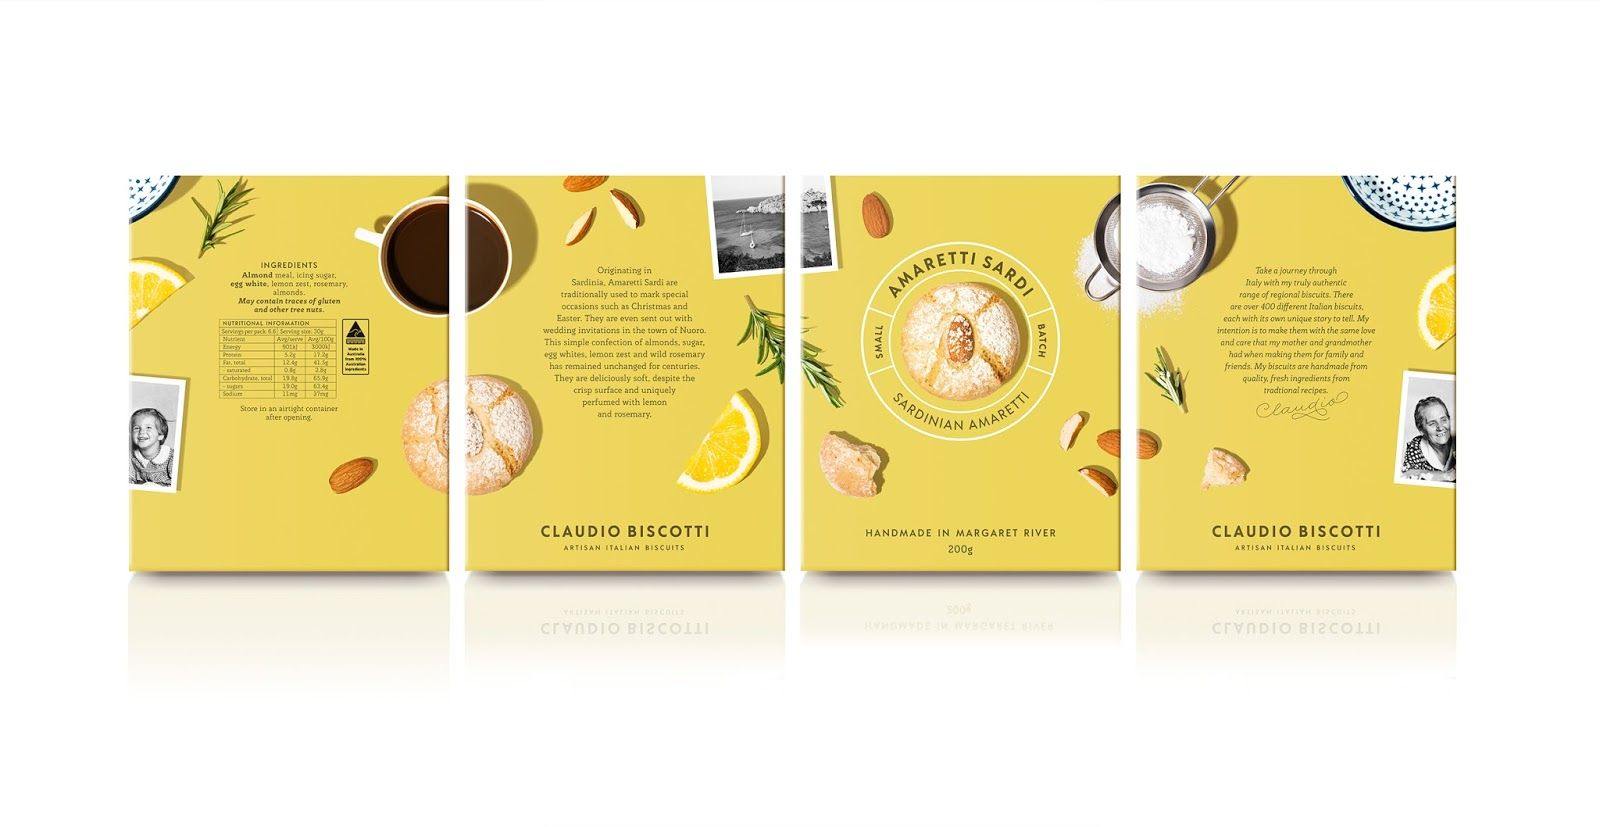 Claudio Biscotti Italian Biscuits